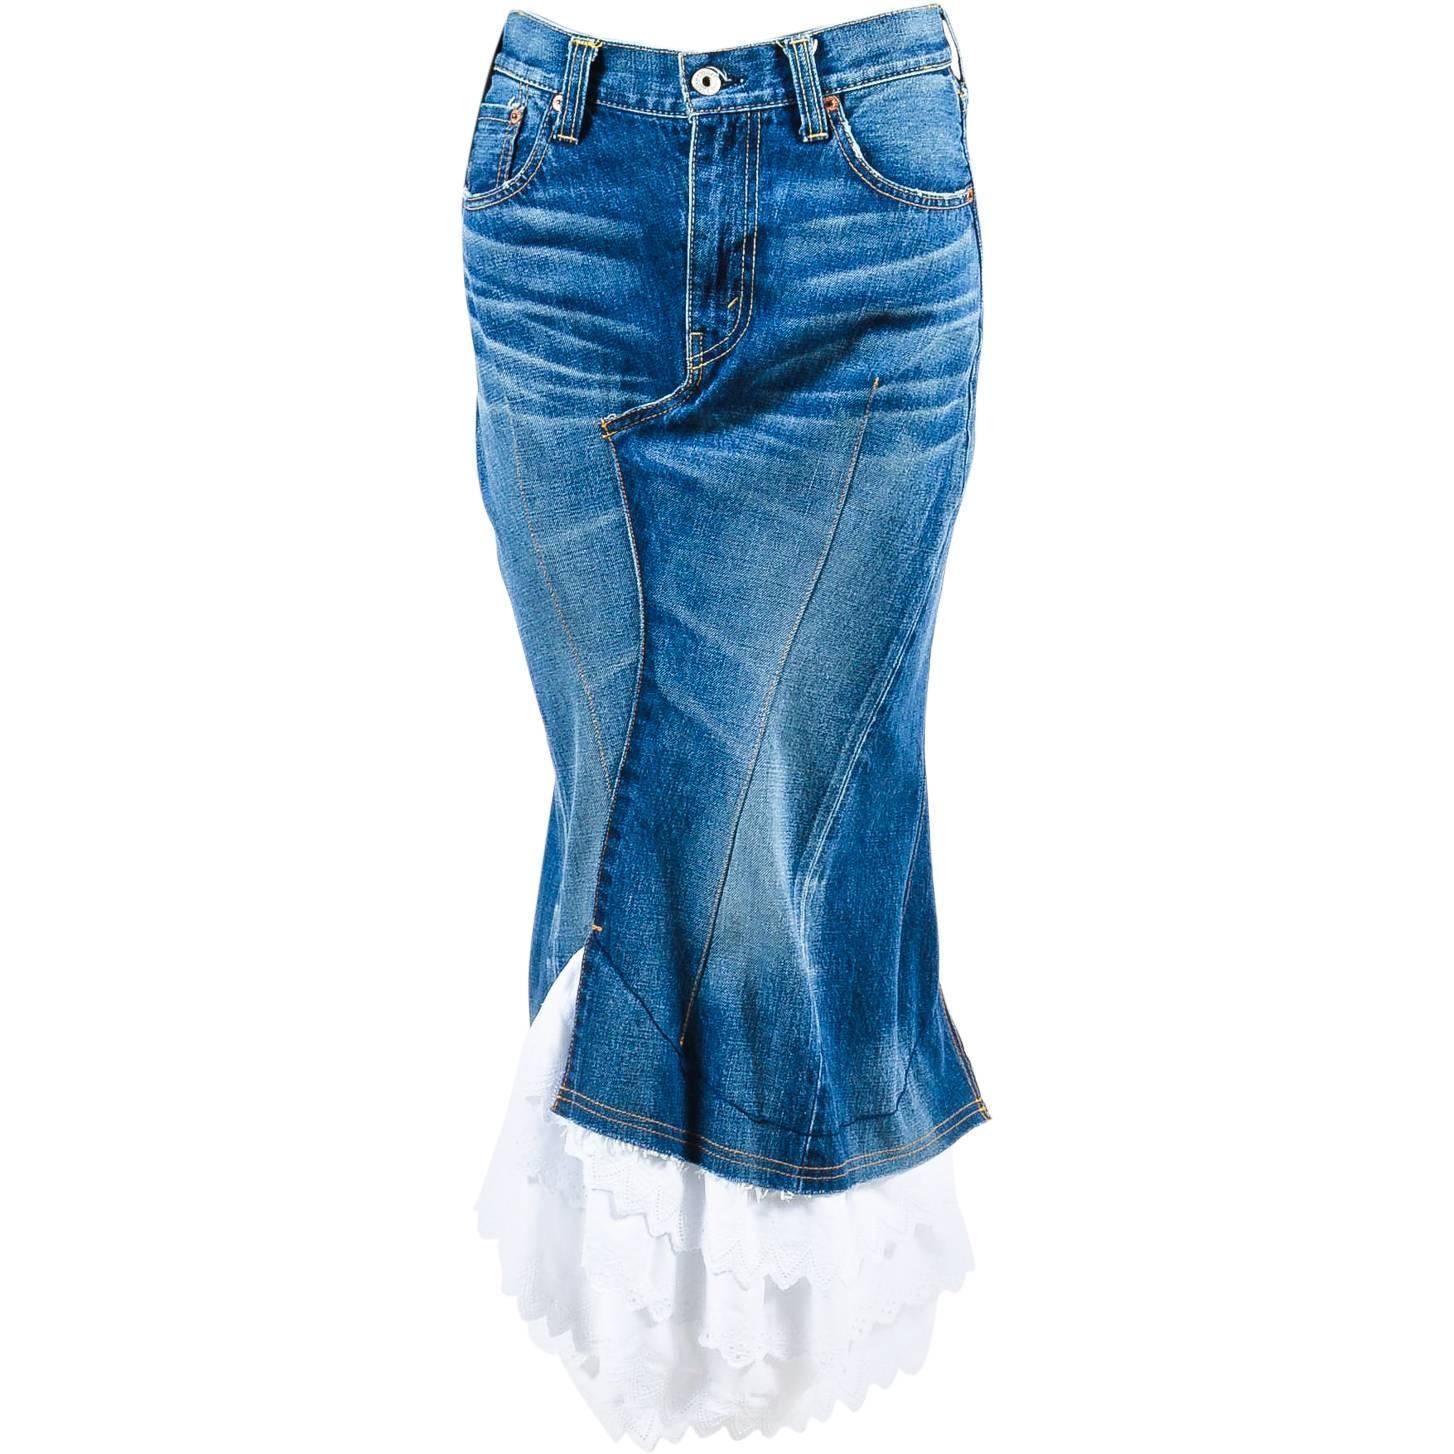 junya watanabe comme des garcons blue white denim ruffle